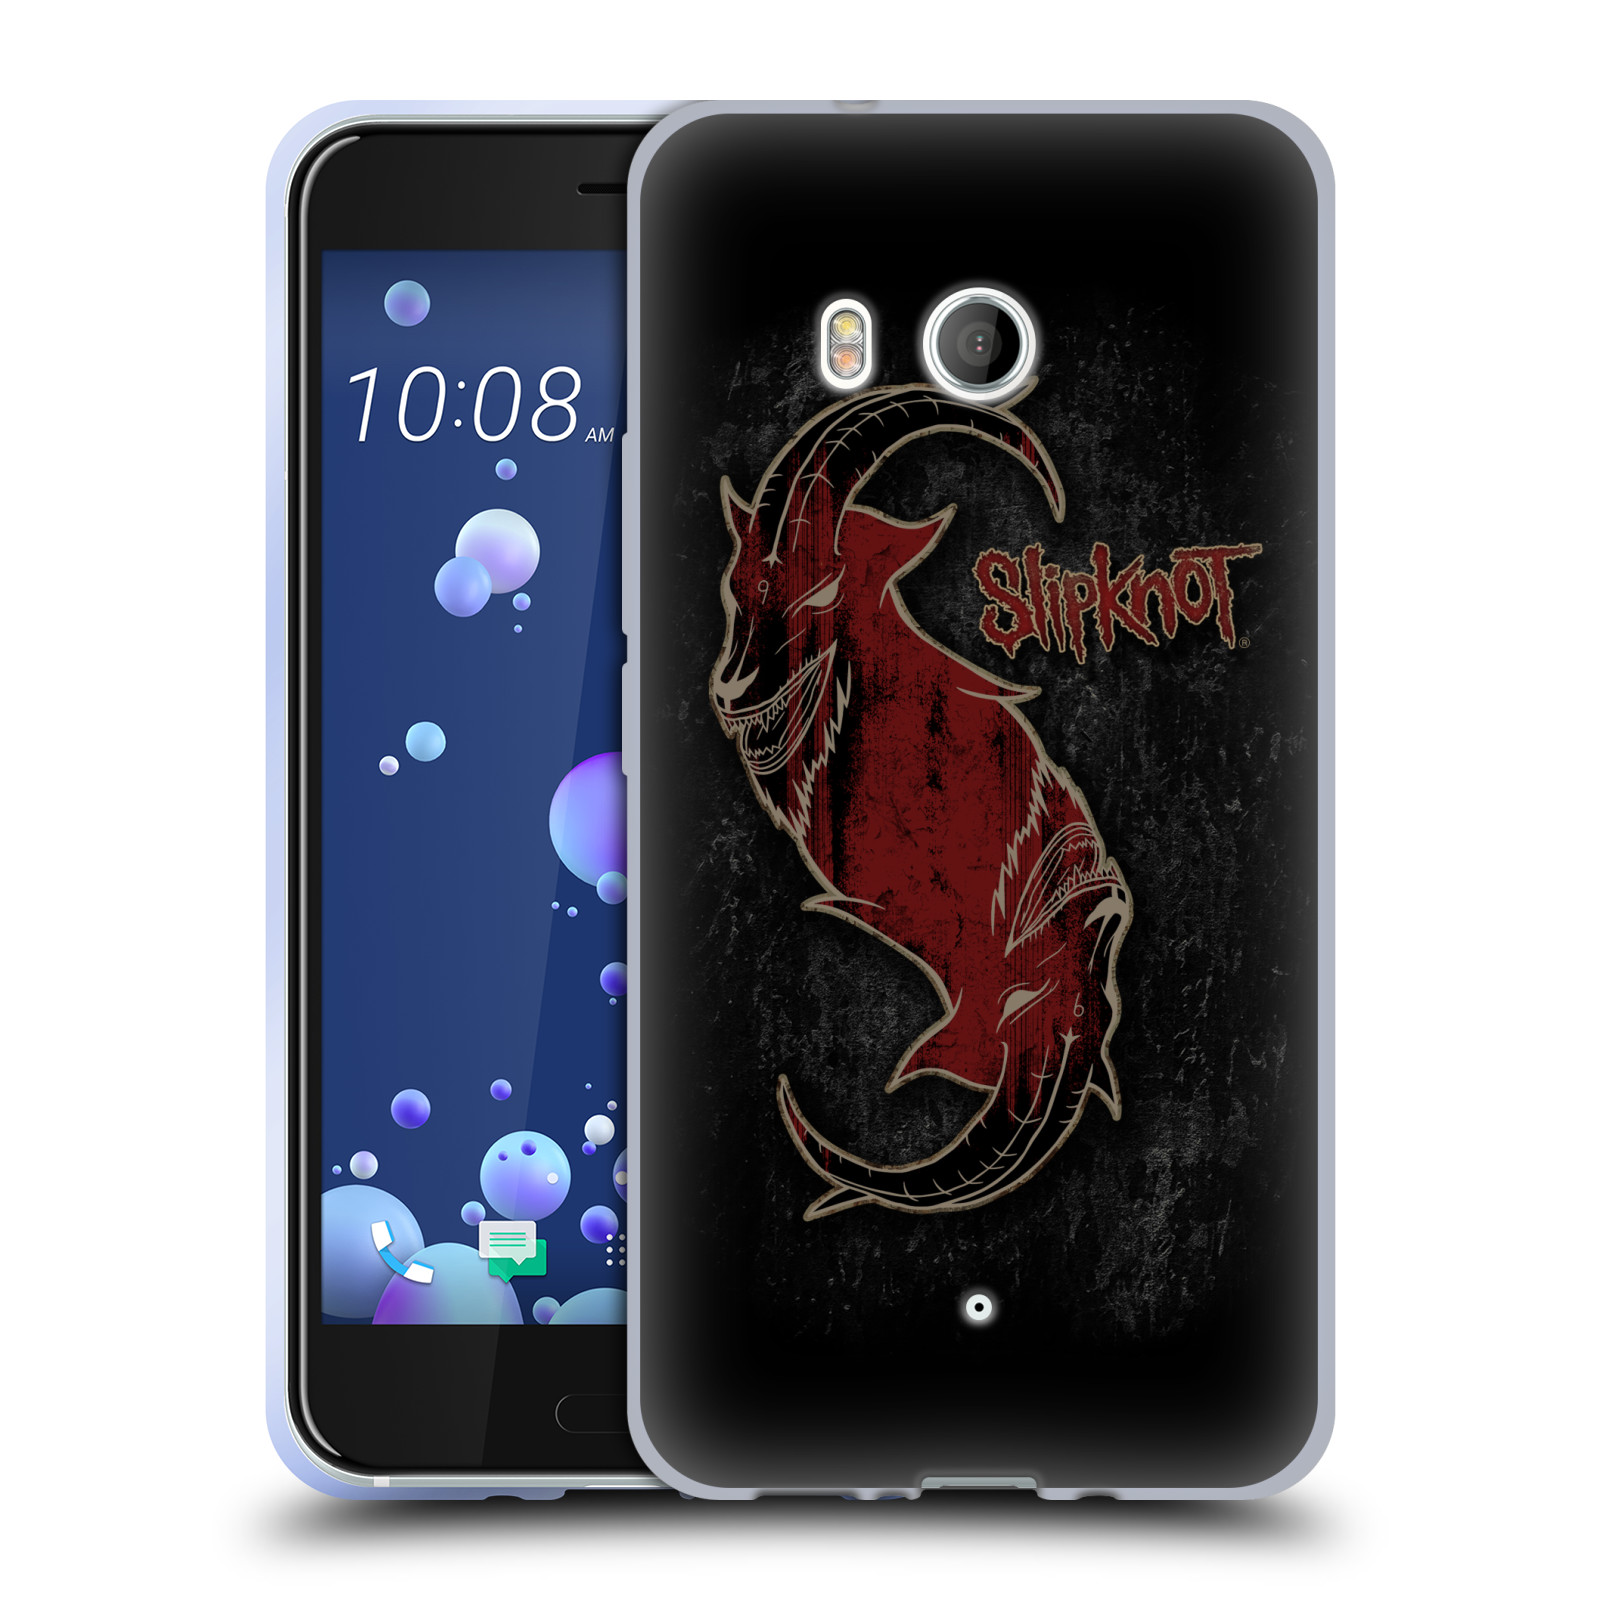 Silikonové pouzdro na mobil HTC U11 - Head Case - Slipknot - Rudý kozel